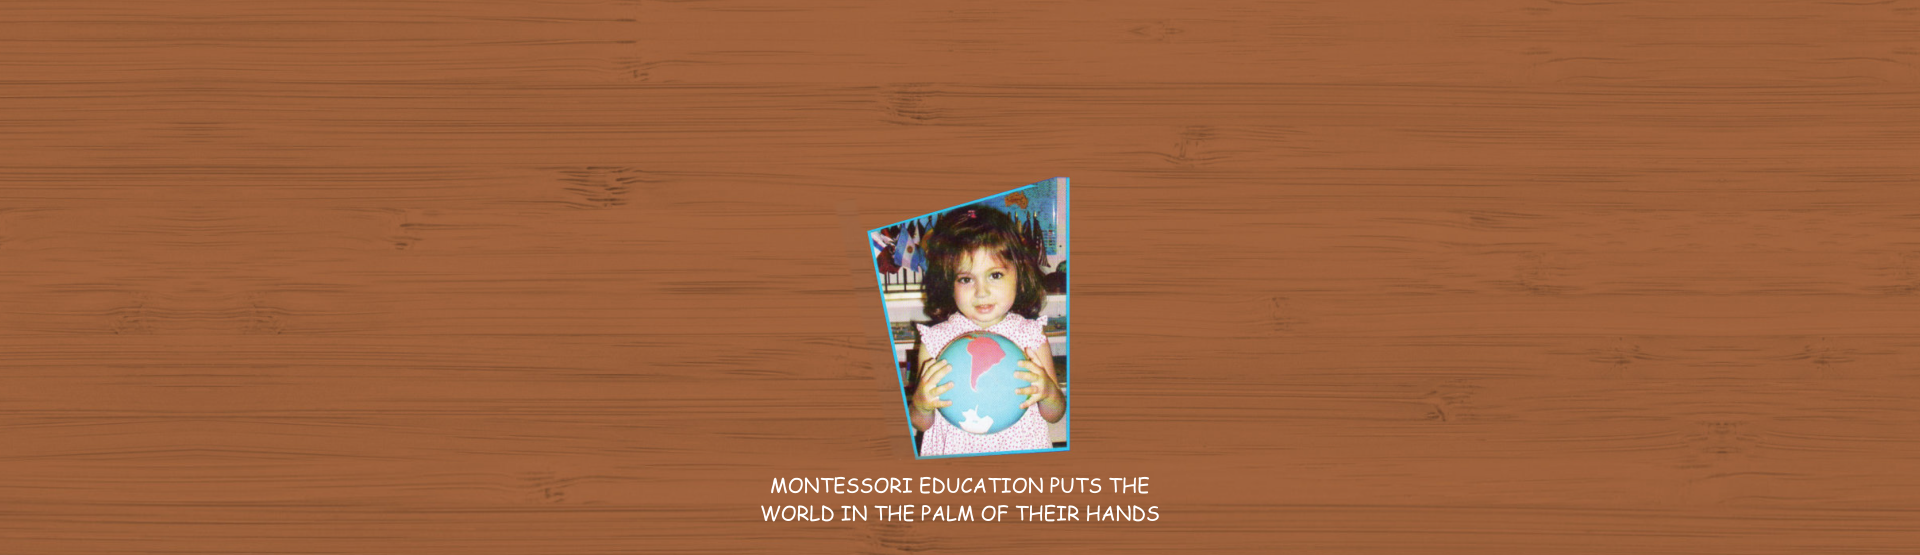 little girl standing holding a globe